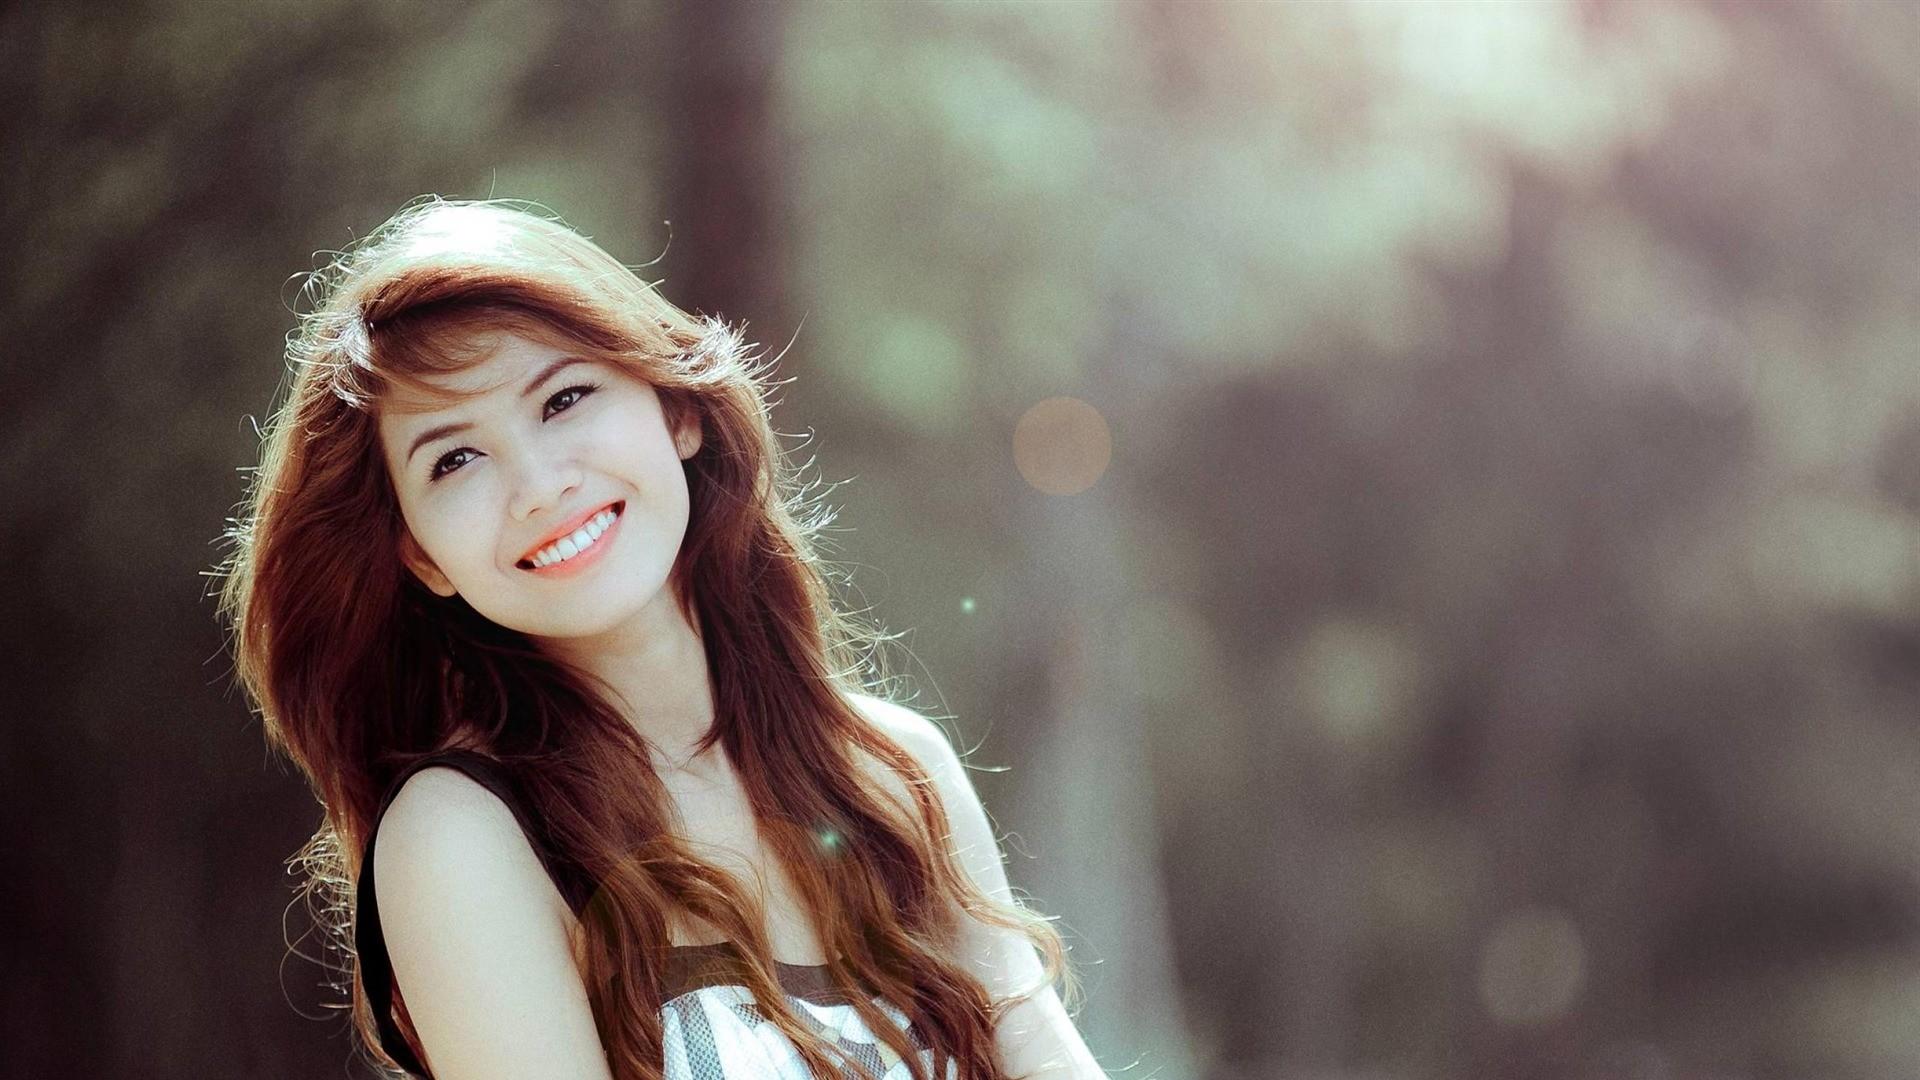 Beautiful Girl Hd Wallpapers 1080p 1920x1080